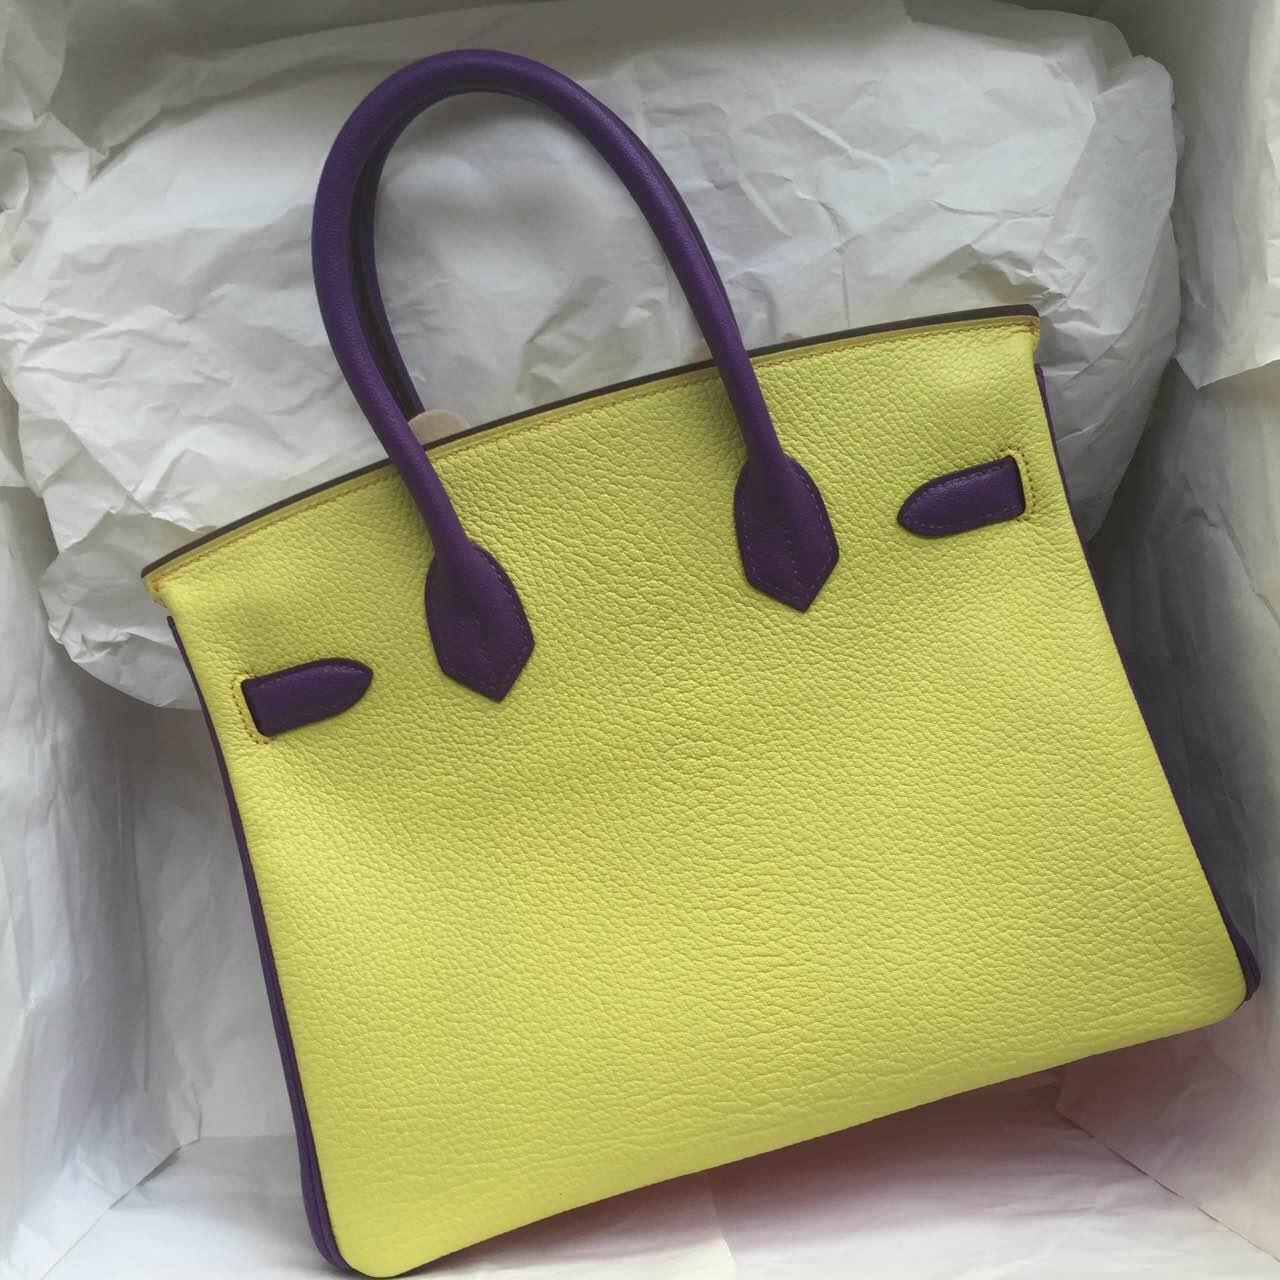 Cheap Hermes Birkin Bag 30cm Purple & Yellow & Pink Chevre Leather Handbag